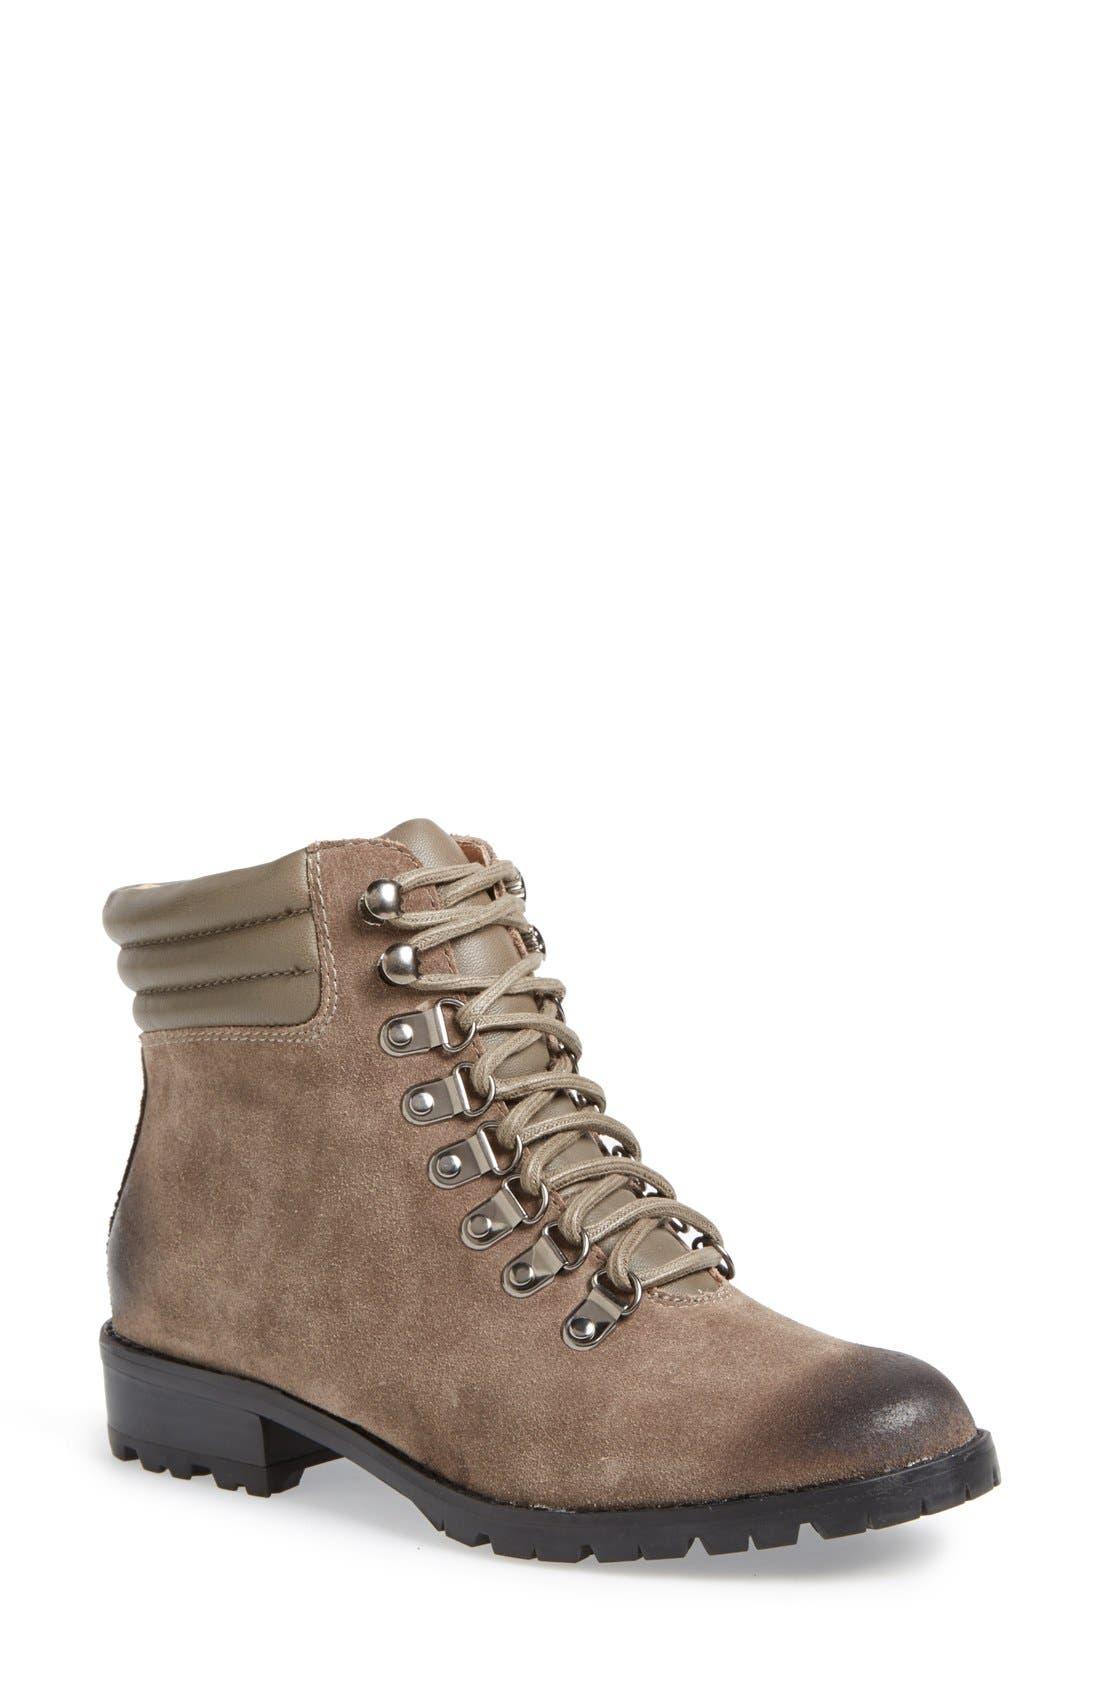 Alternate Image 1 Selected - Corso Como 'Whisper' Hiking Boot (Women)